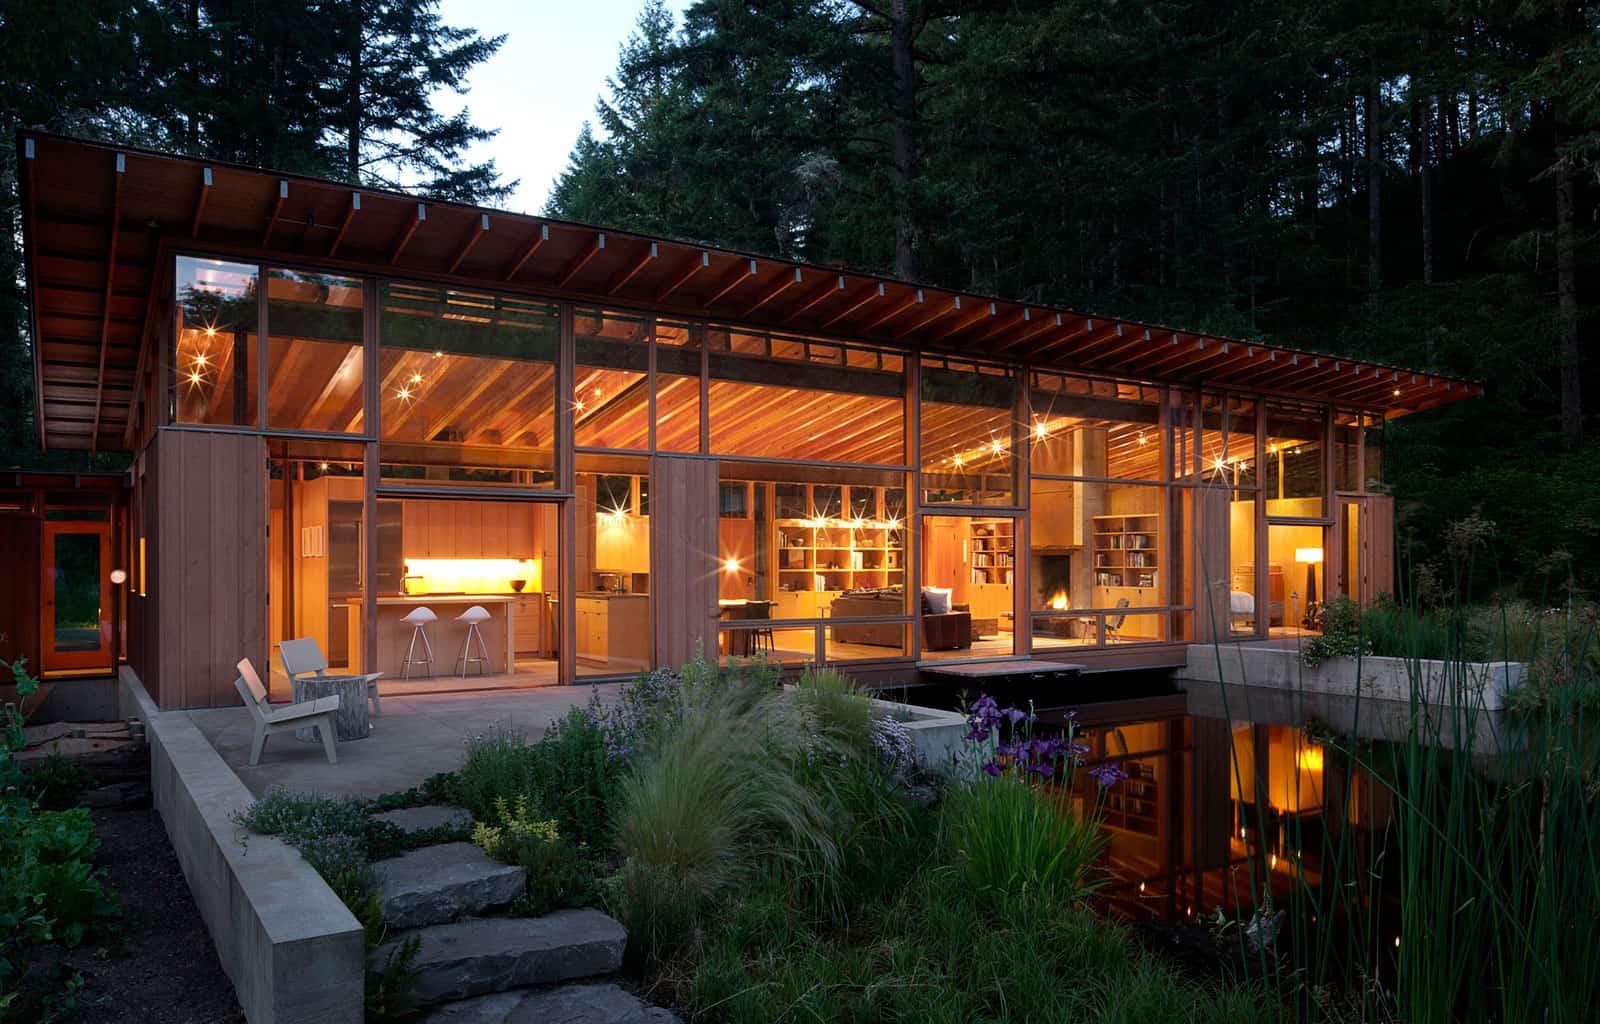 Cutler Anderson Architect Designs a Single-Family Home in Oregon